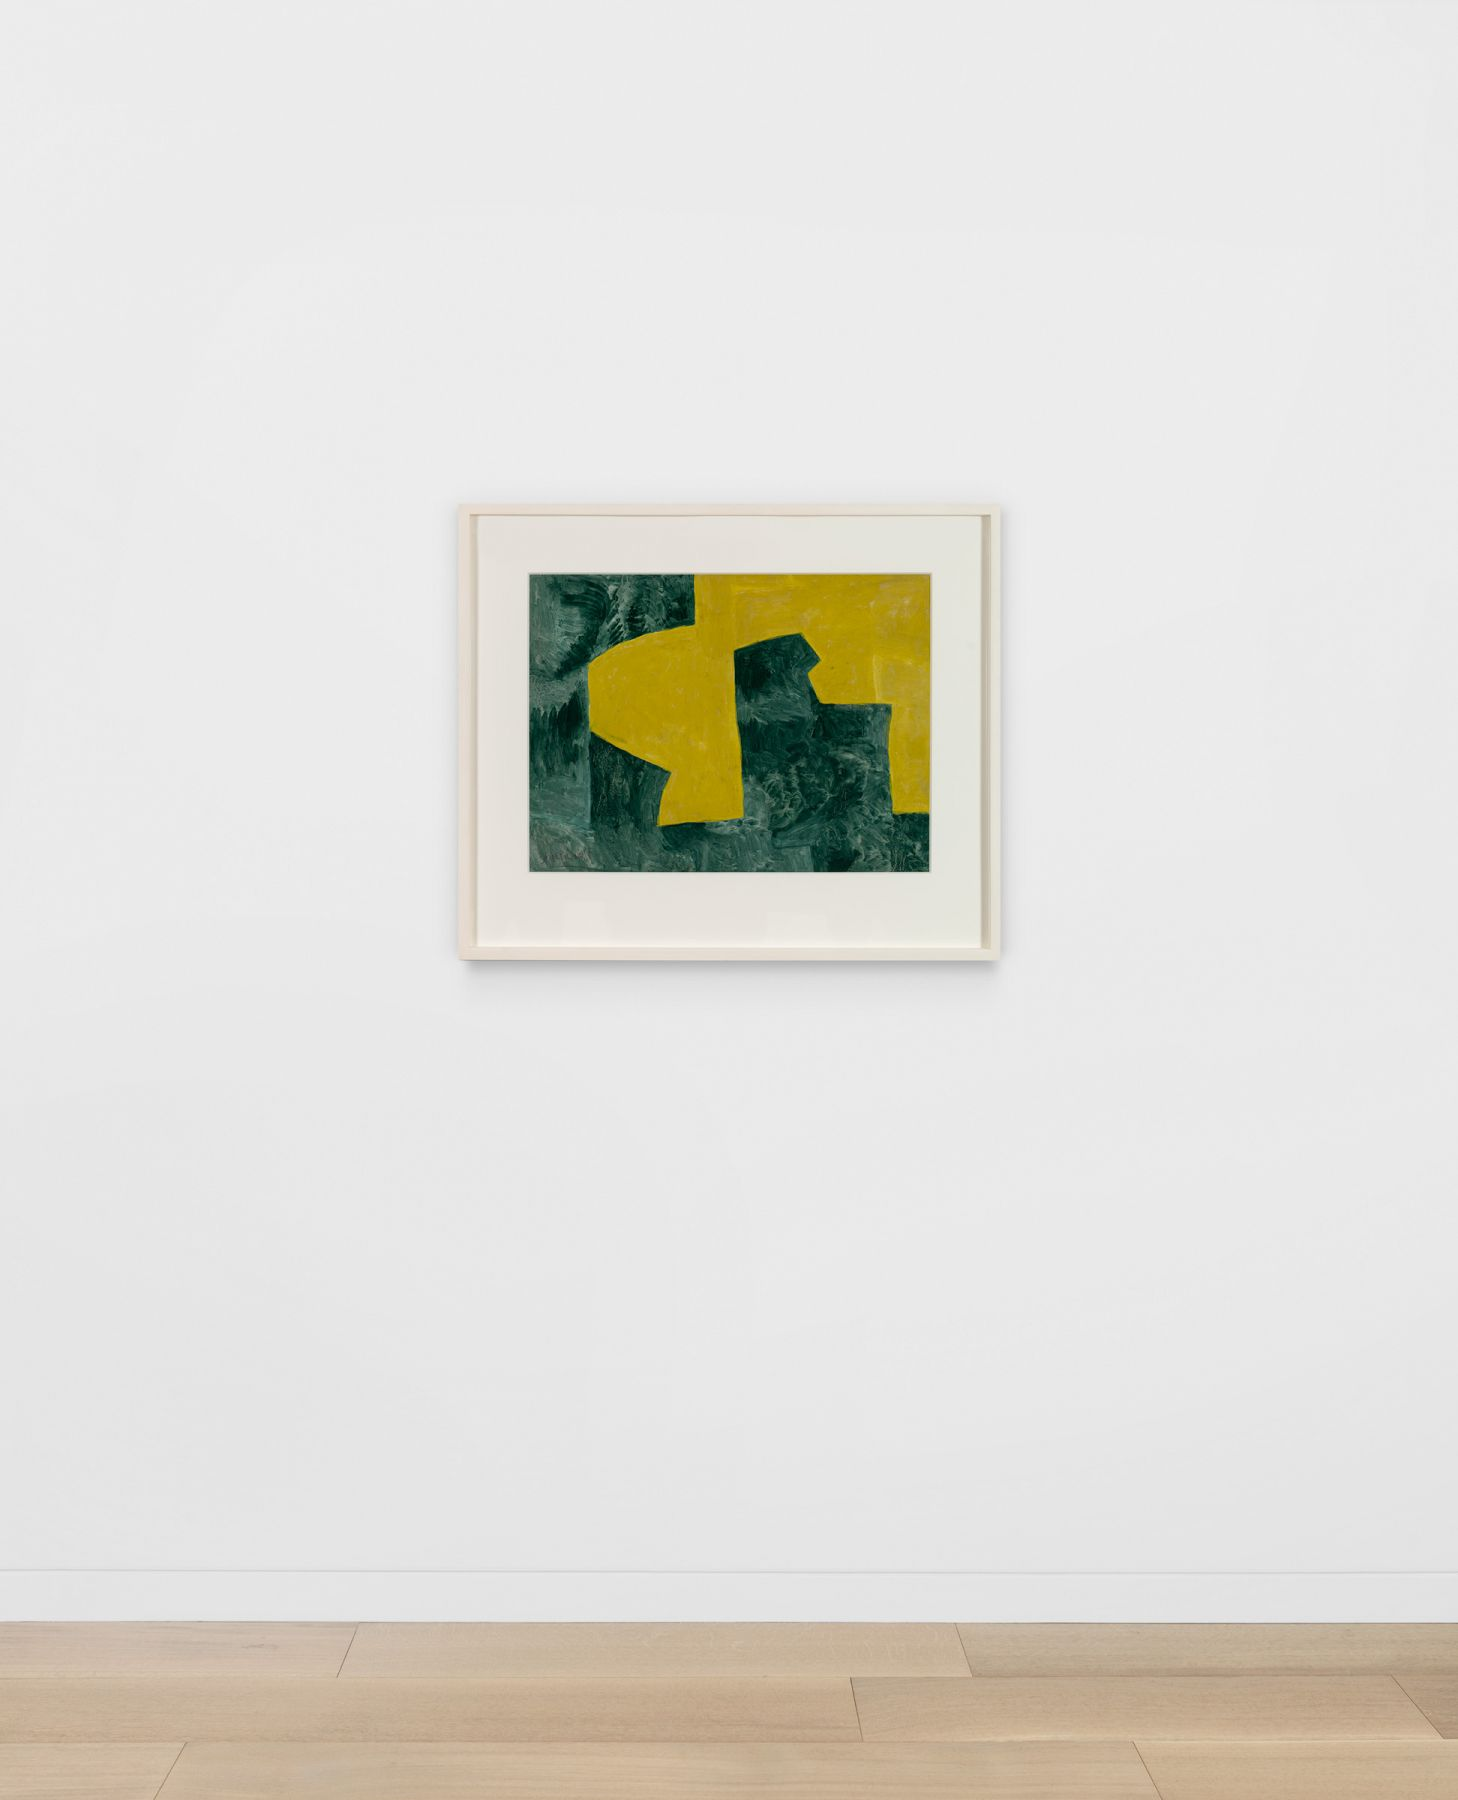 Serge Poliakoff - Jaune et Vert 1